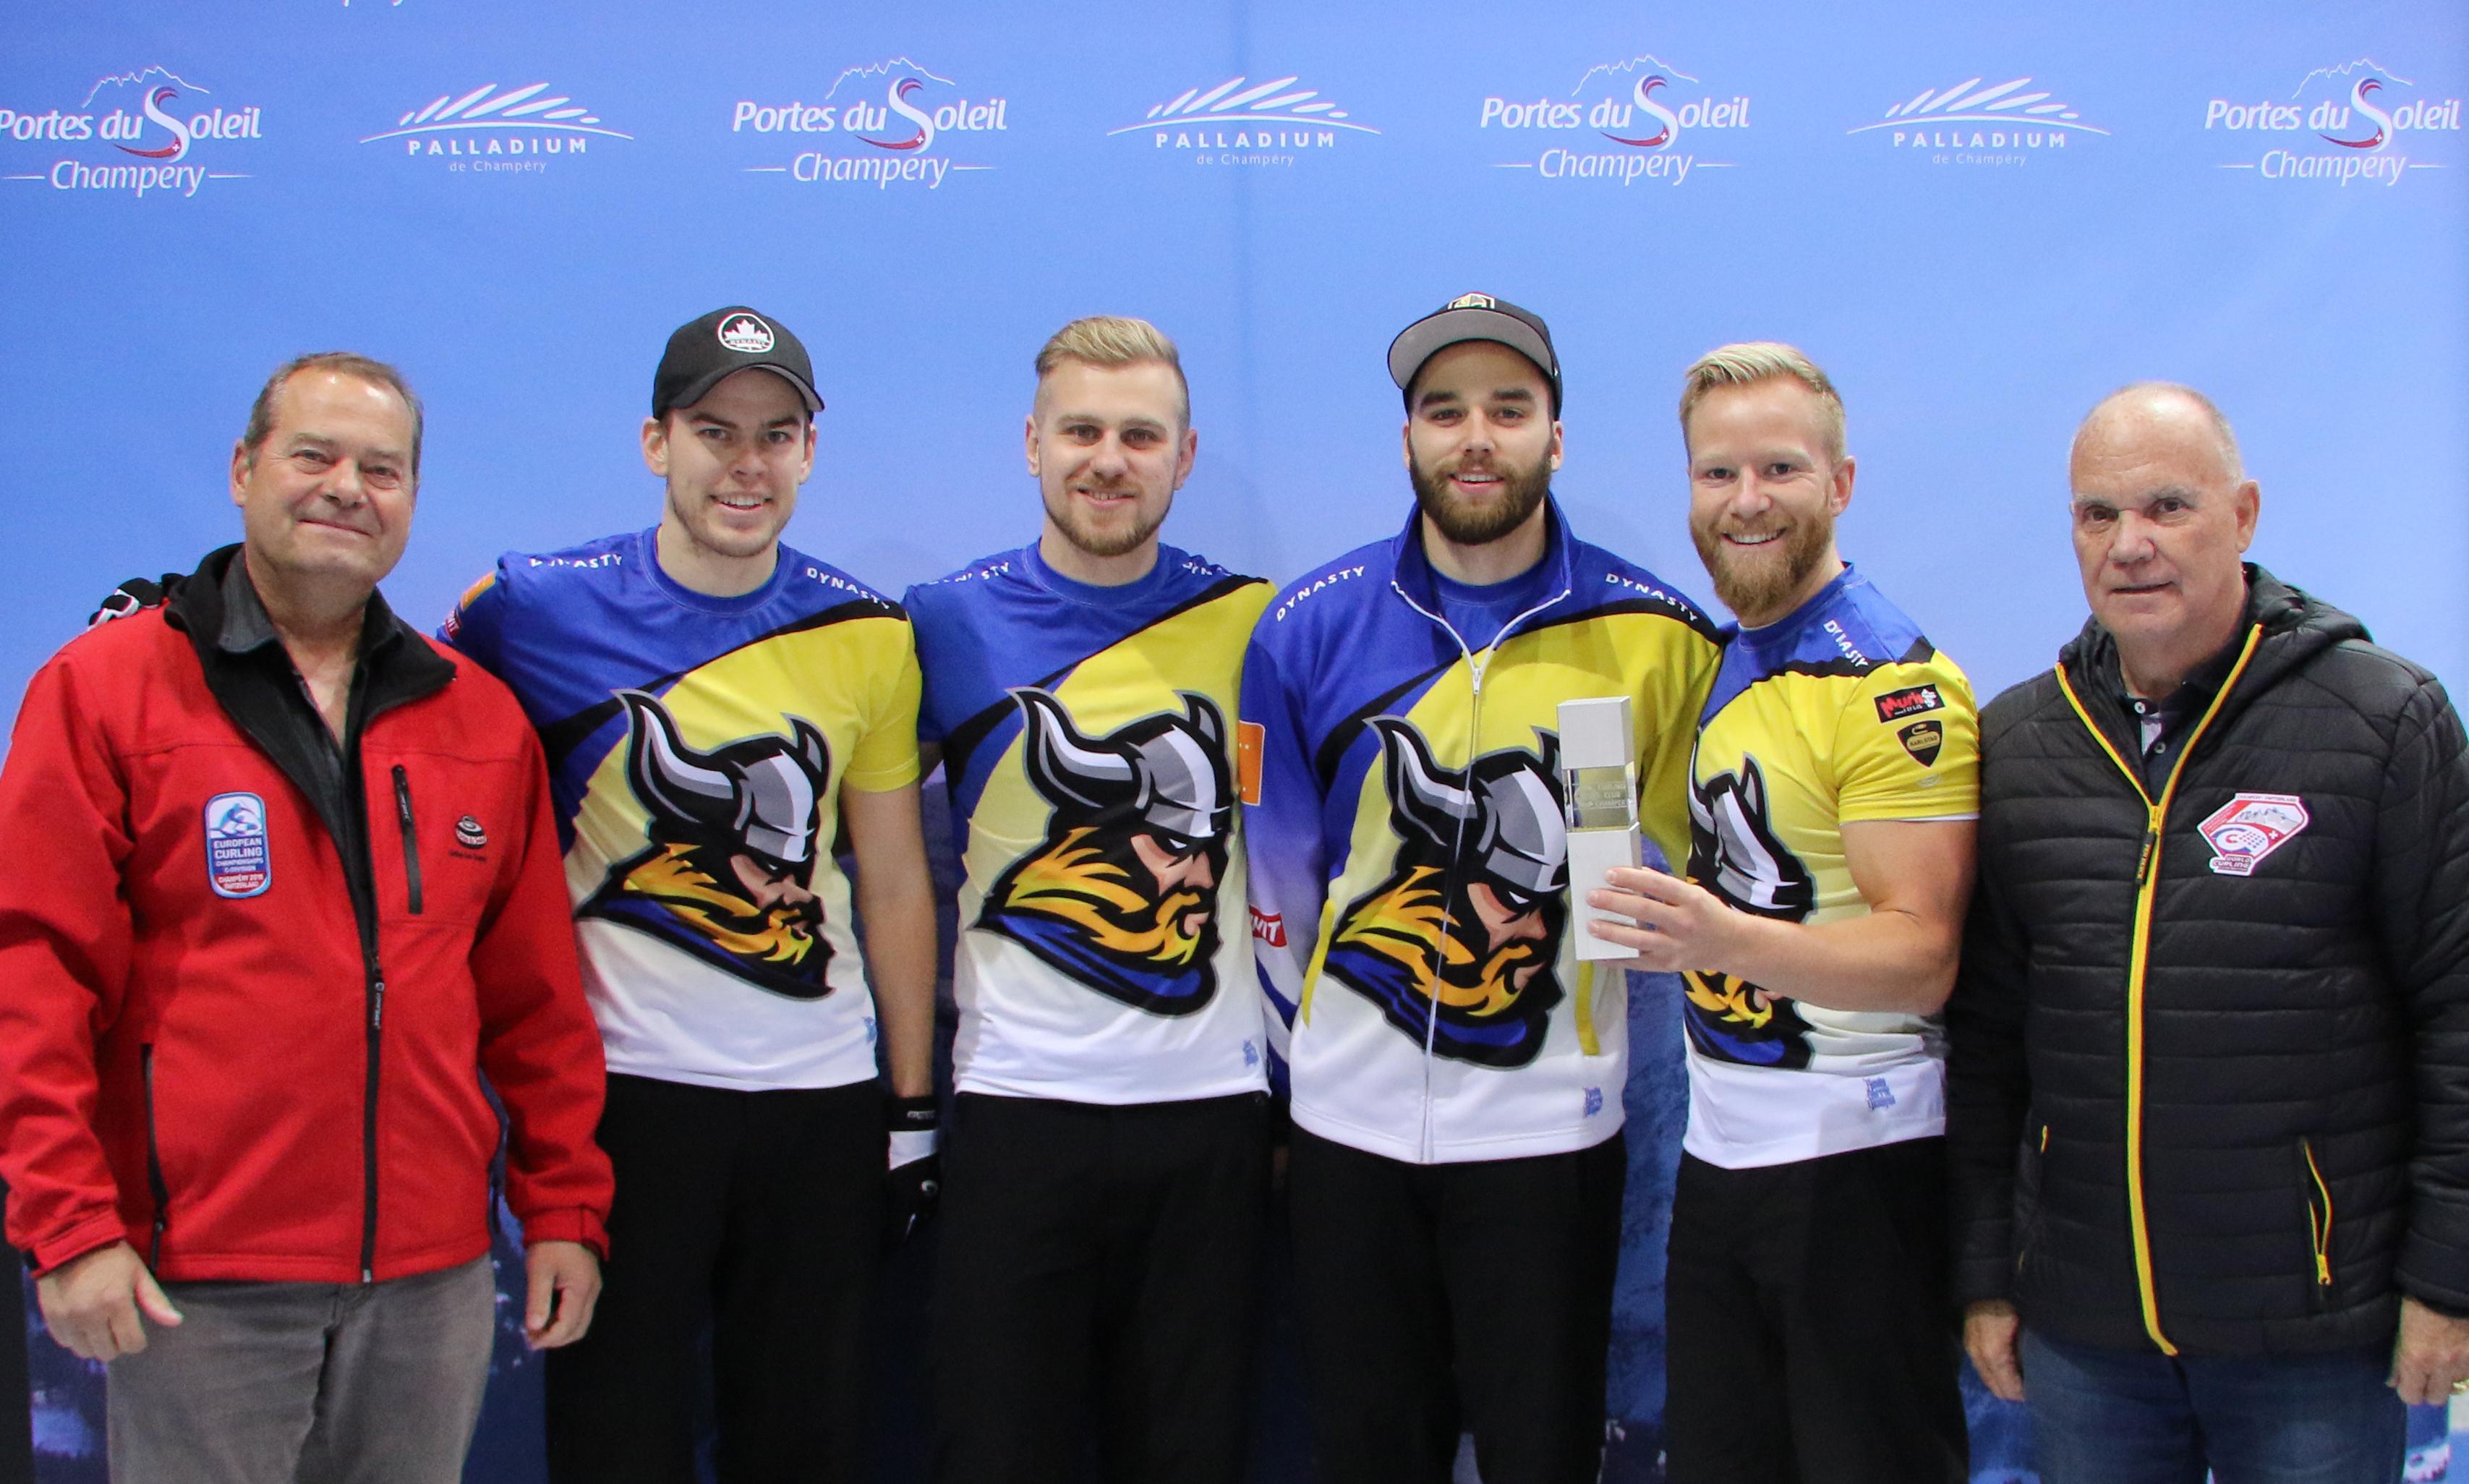 Niklas Edin wins Curling Masters Champery